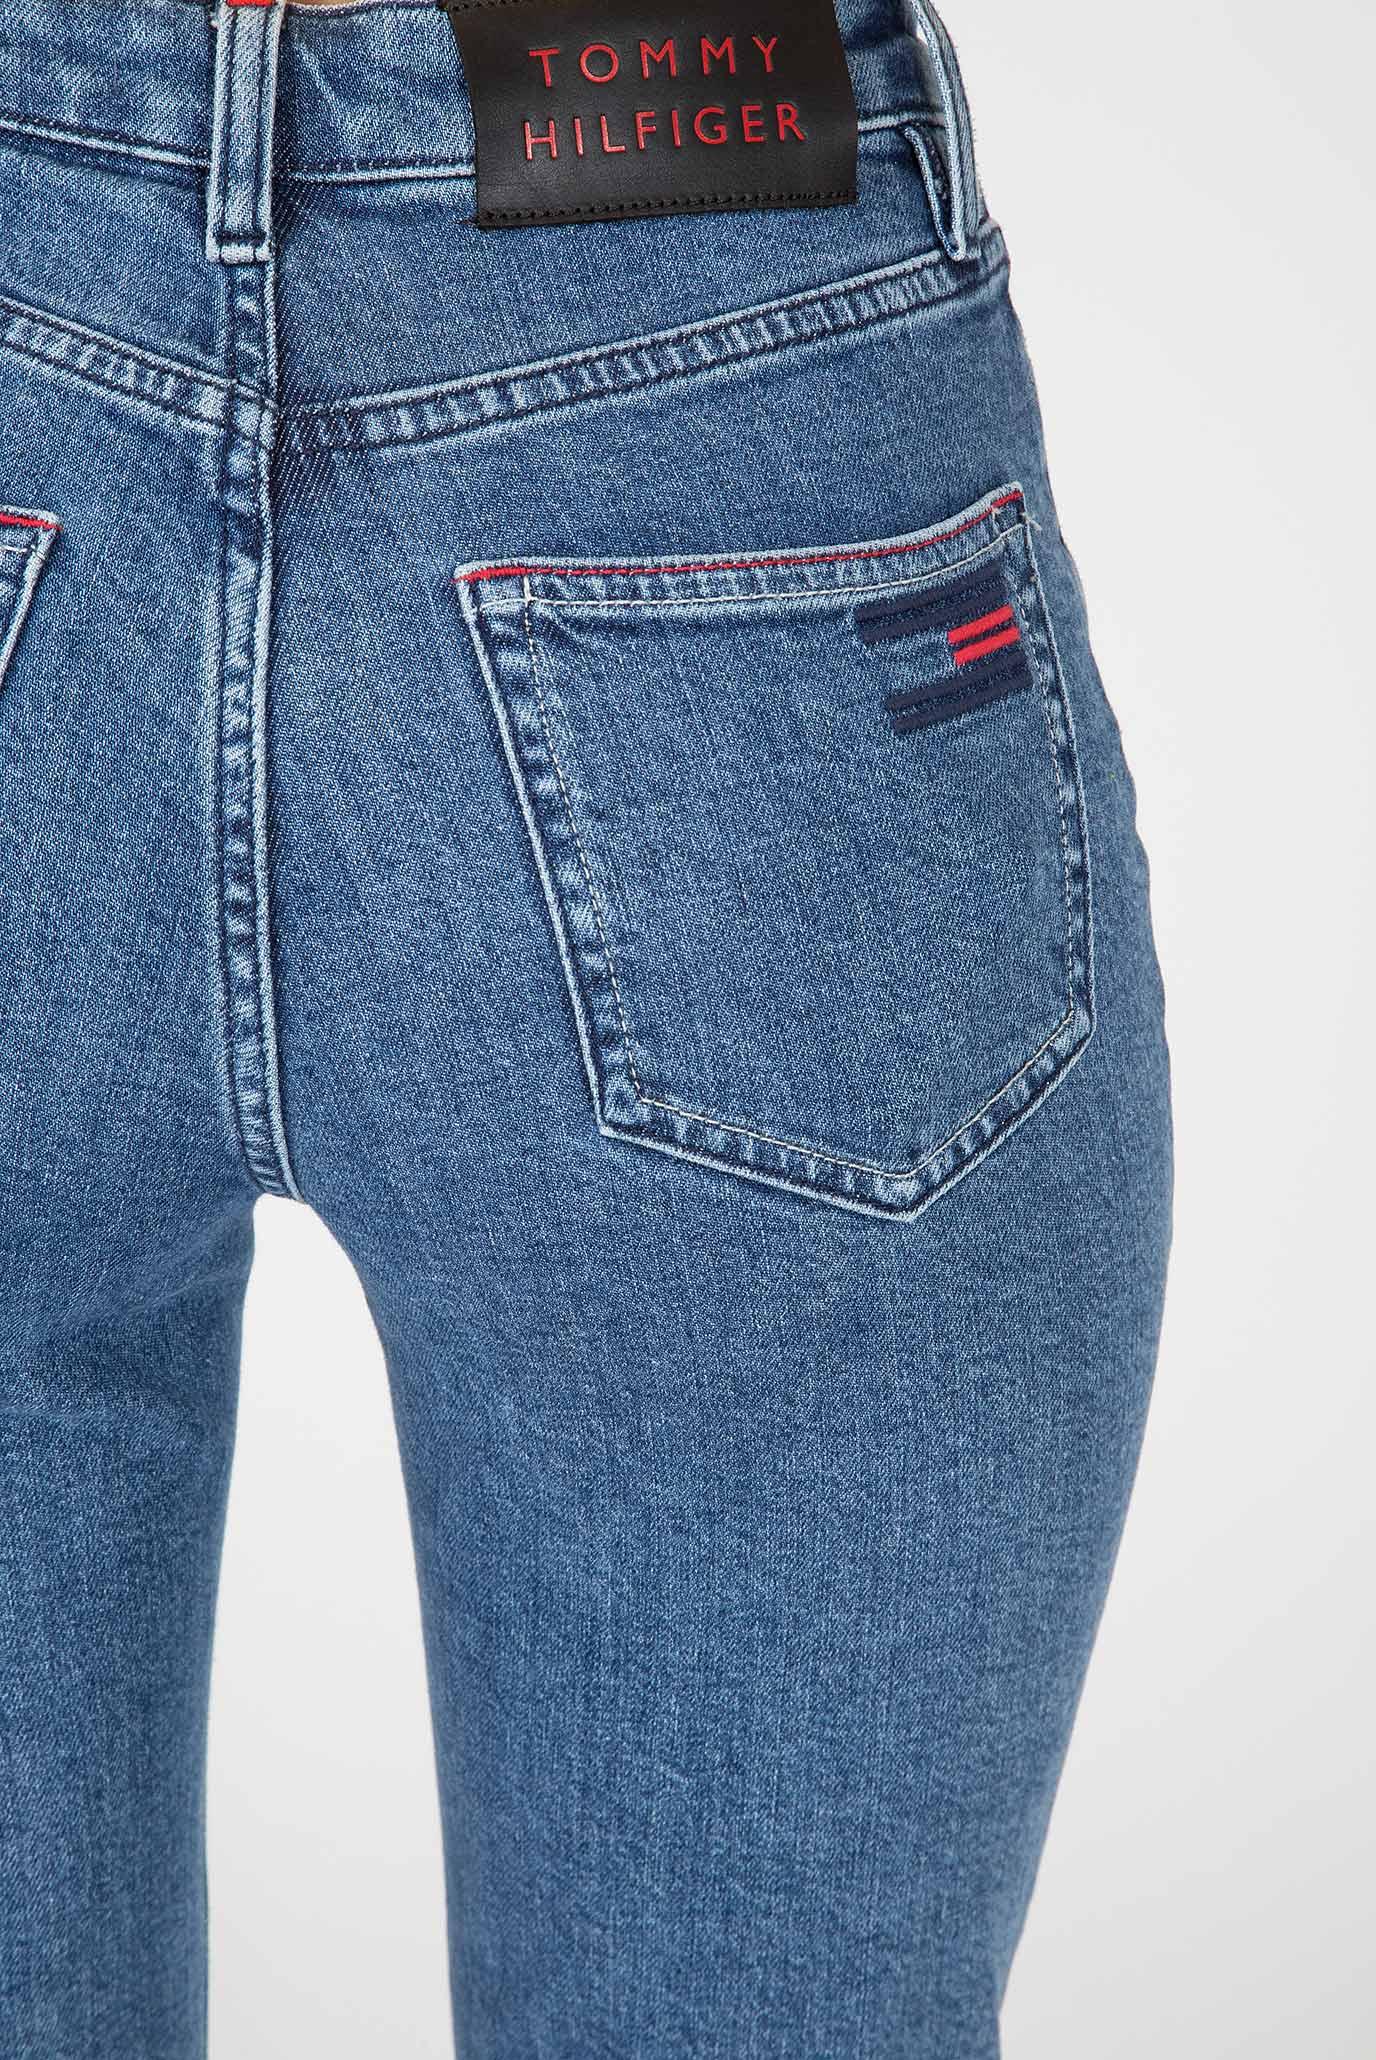 Купить Женские синие джинсы GRAMERCY TAPERED HW A ALEK Tommy Hilfiger Tommy Hilfiger WW0WW24468 – Киев, Украина. Цены в интернет магазине MD Fashion